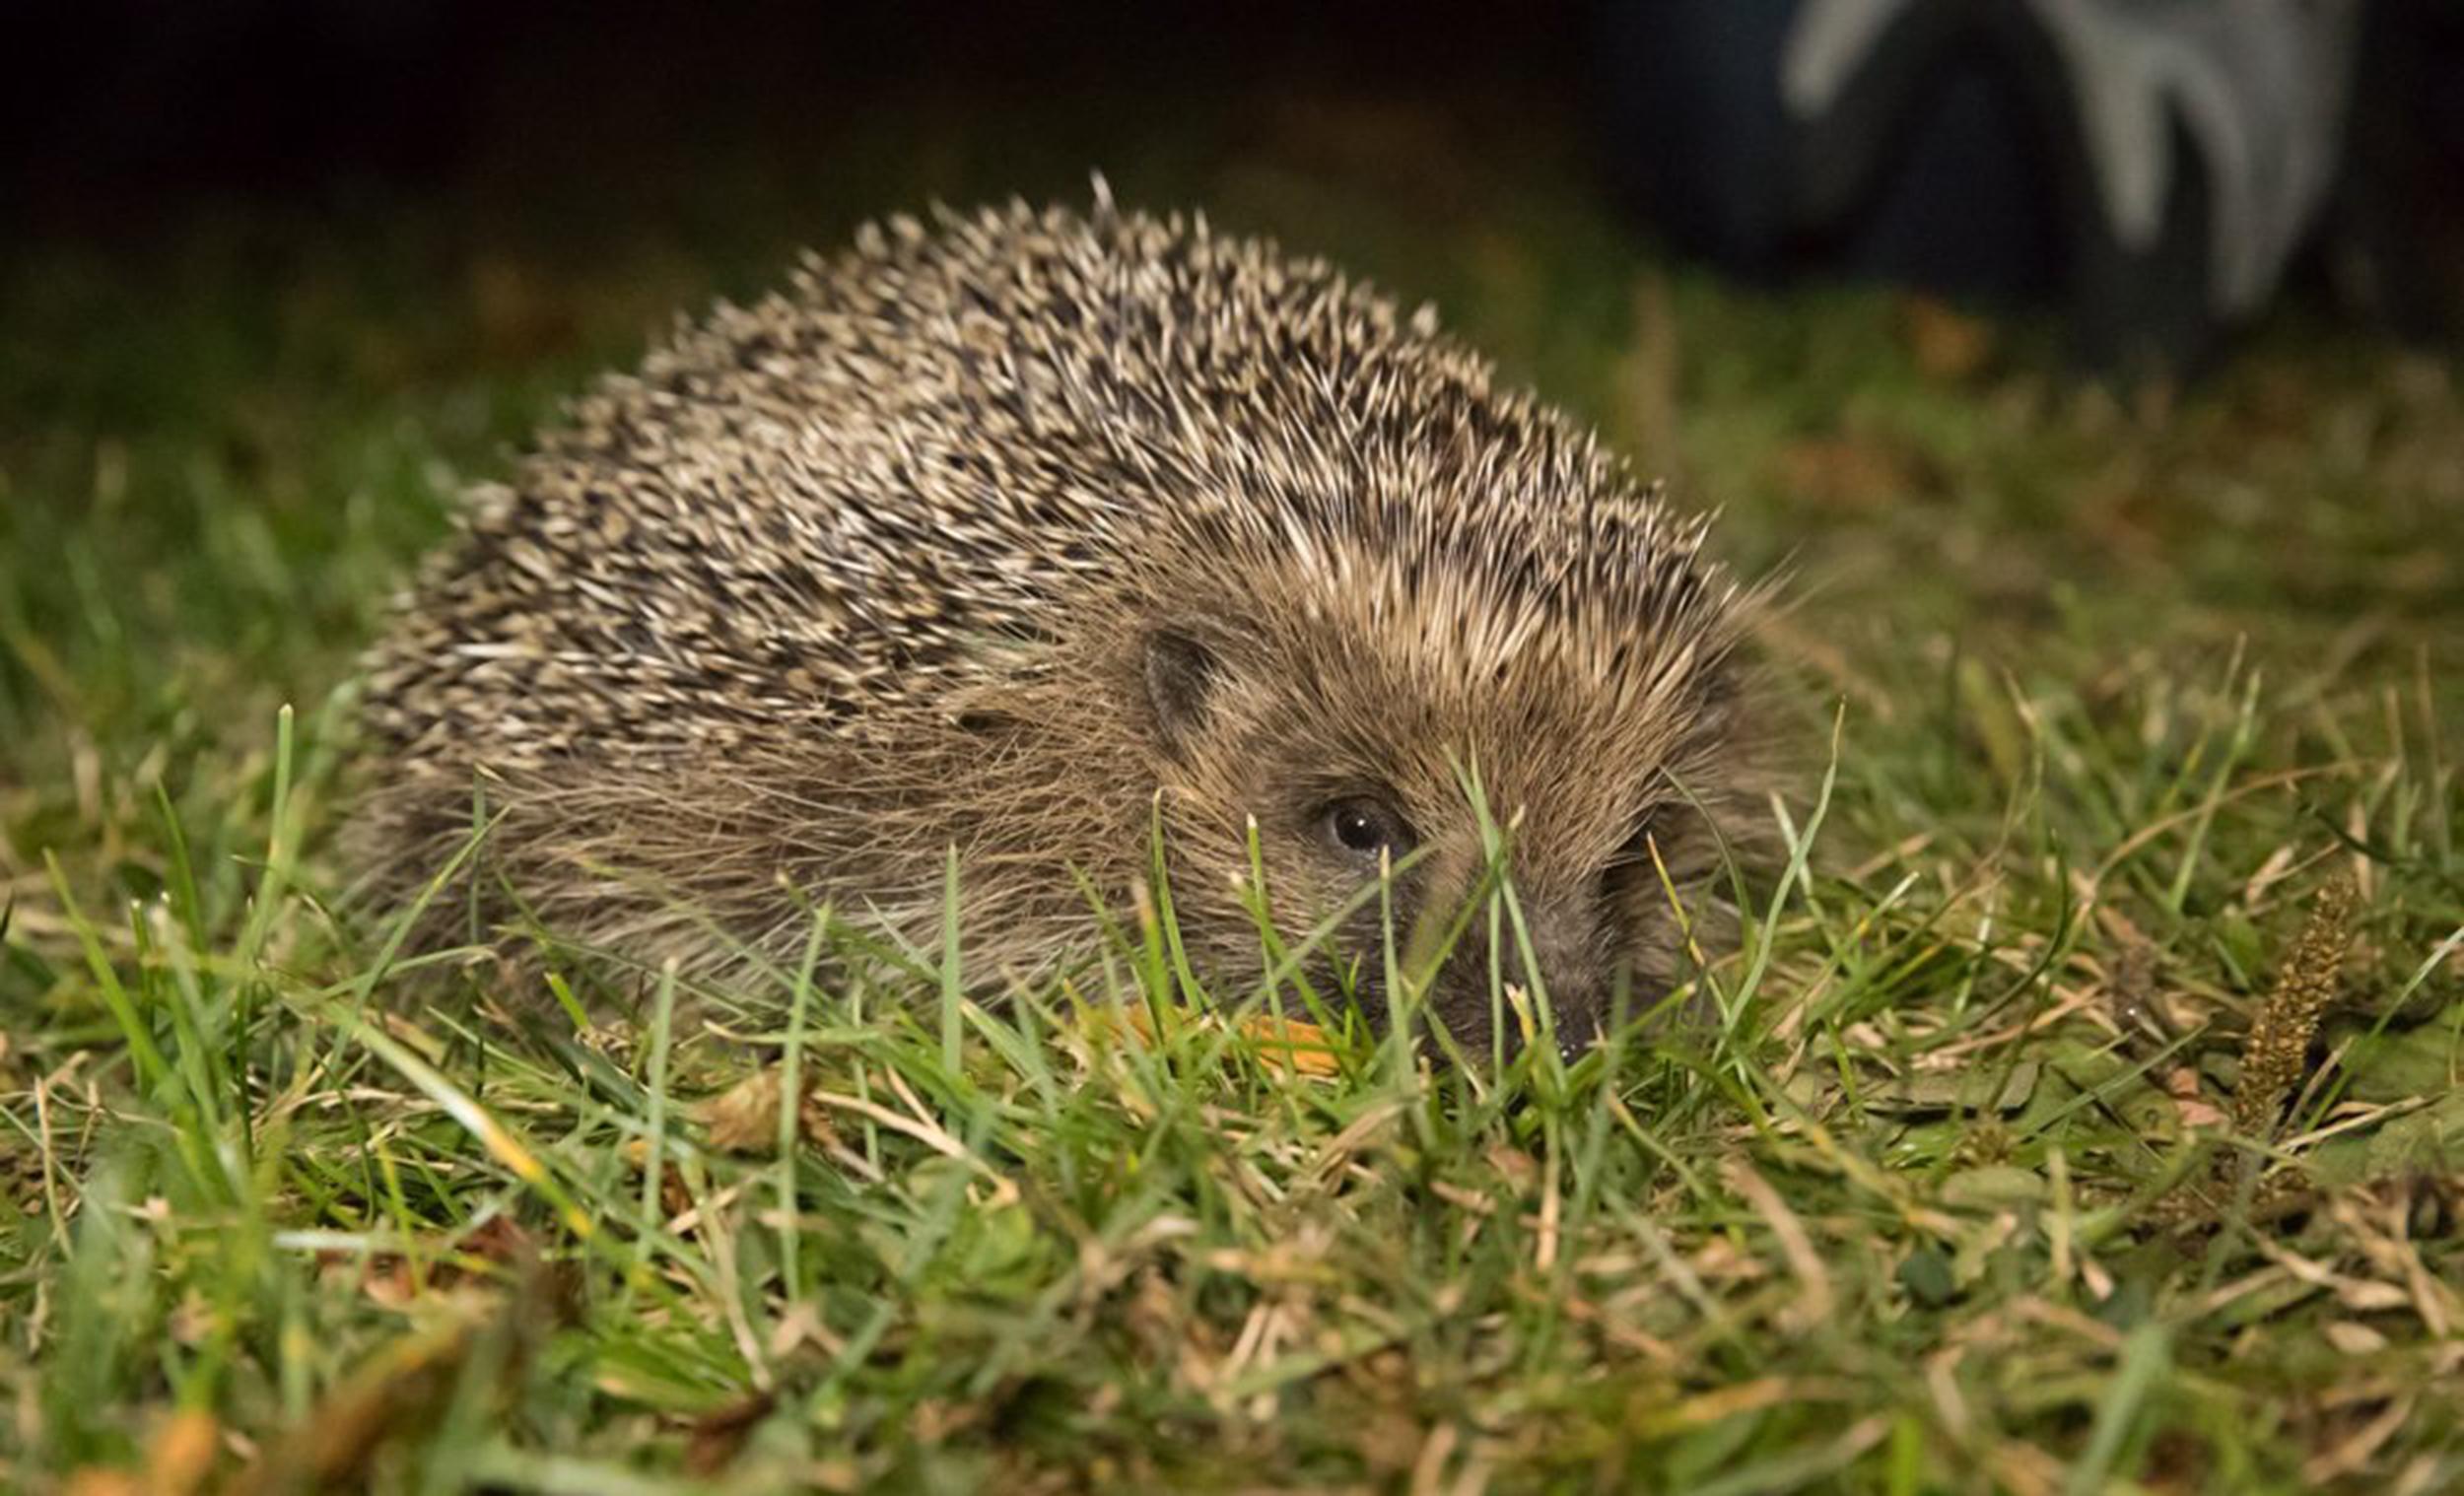 Image: Hedgehog